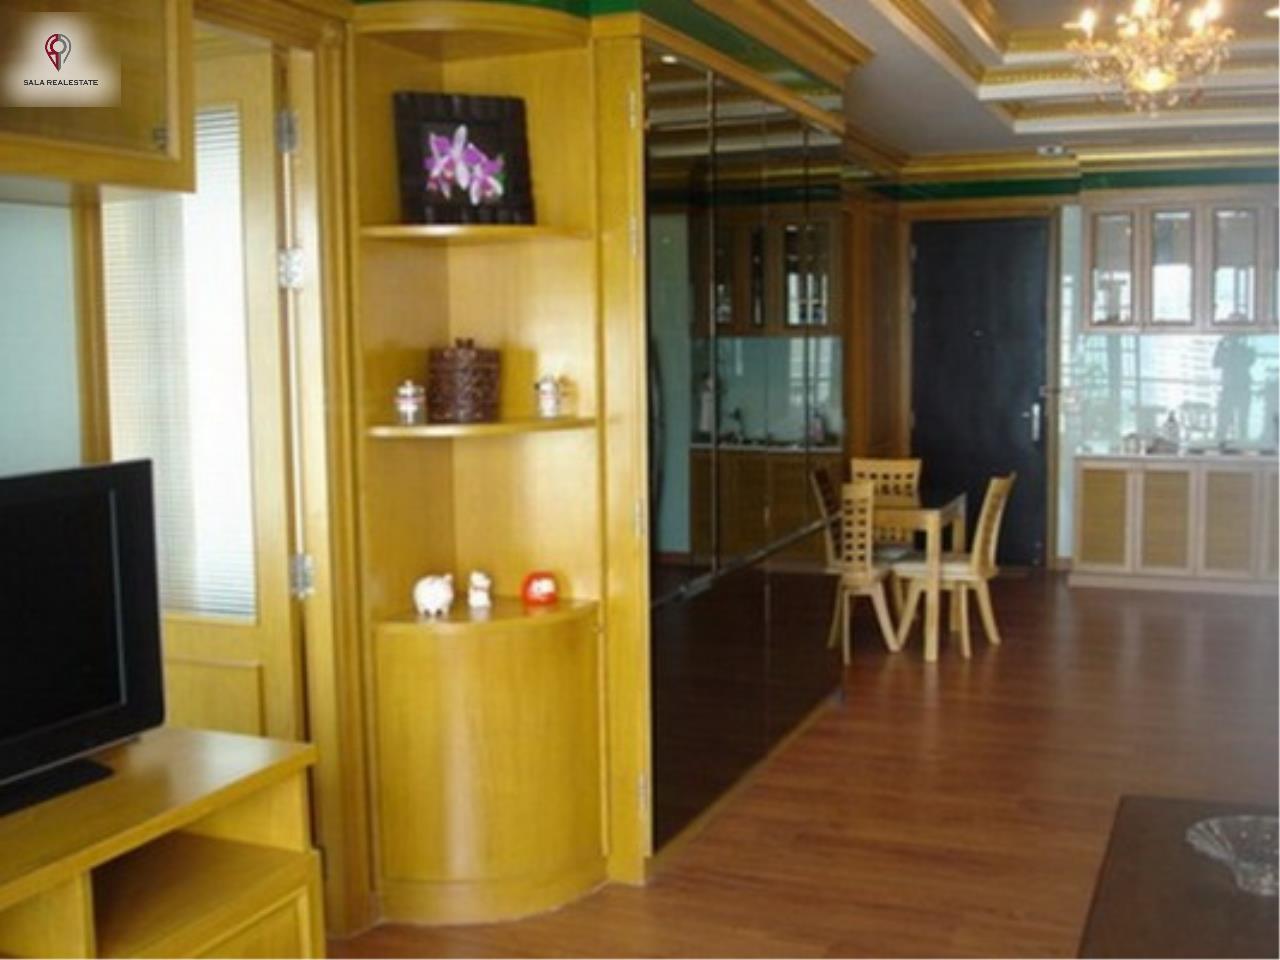 SALA ESTATE Agency's BAAN KLANG KRUNG SIAM-PATHUMWAN 4